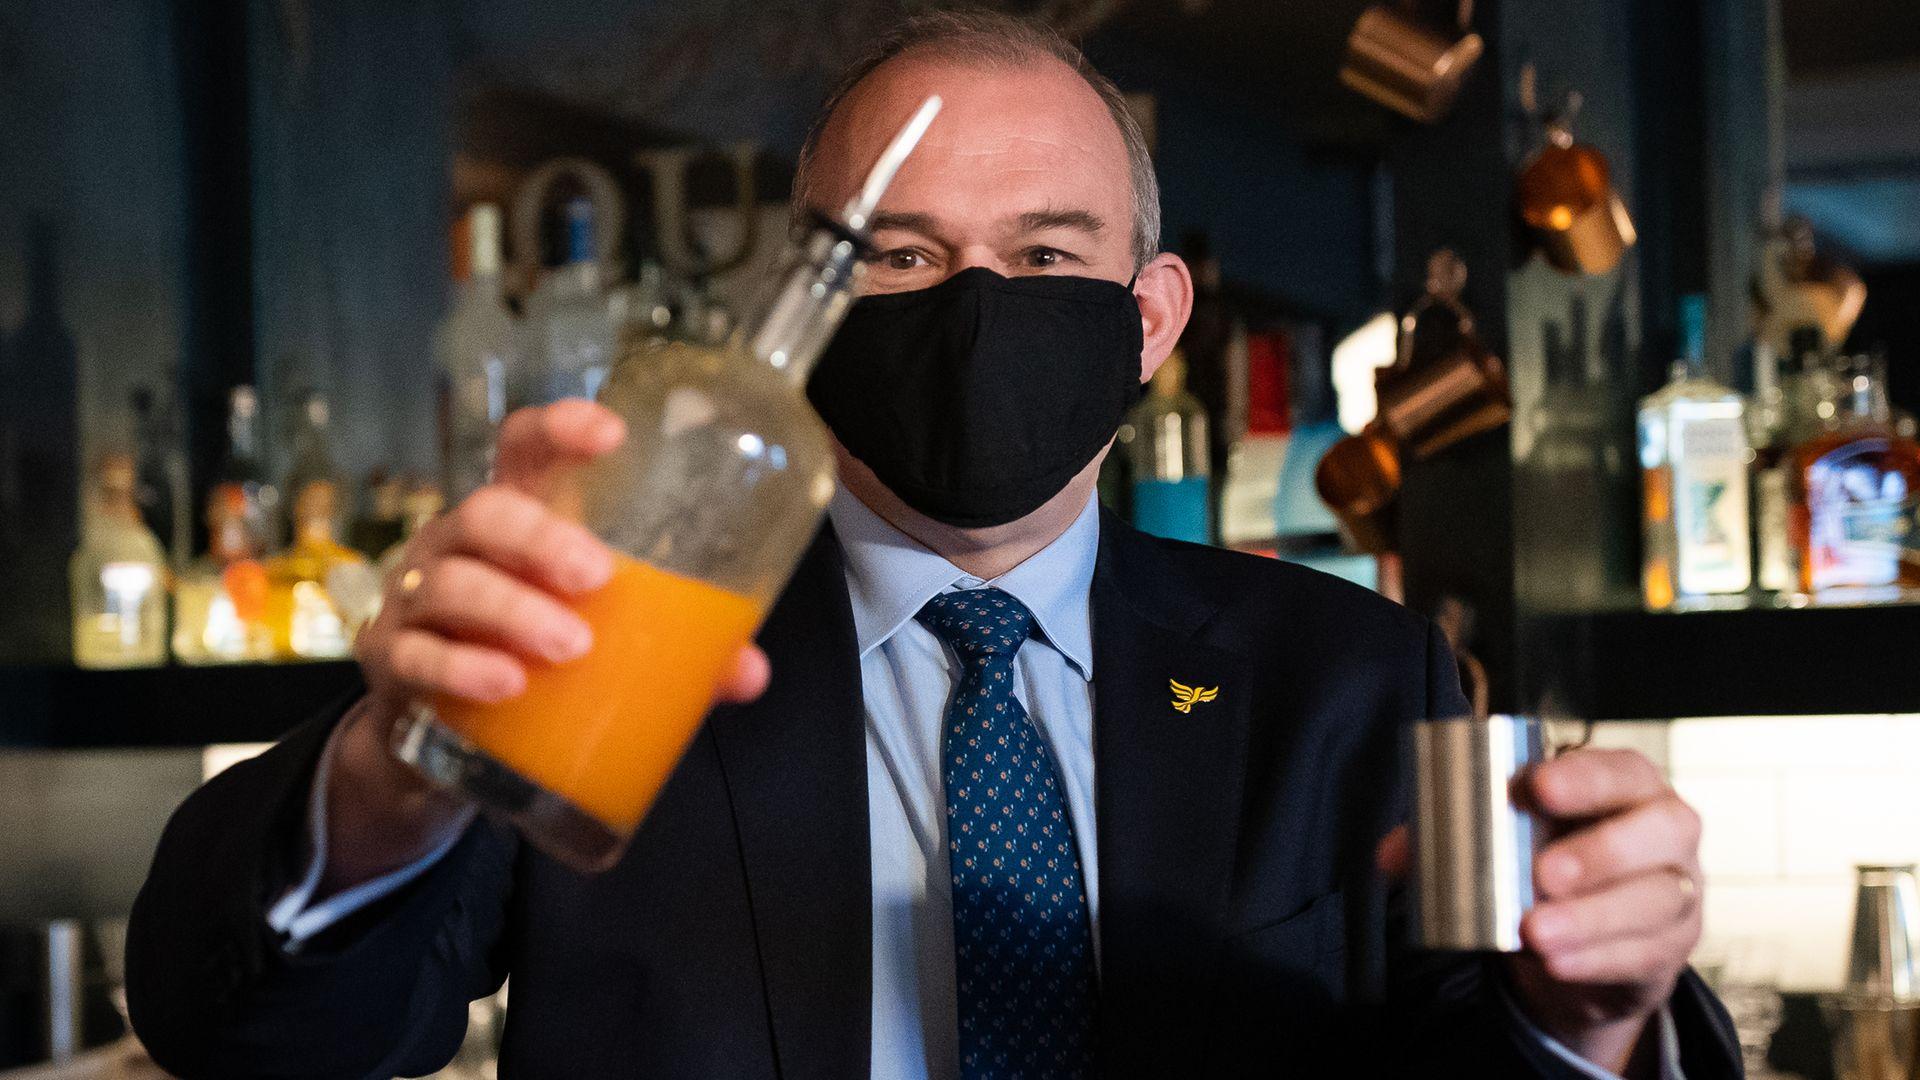 Liberal Democrats leader Sir Ed Davey tries his hand at cocktail making during a visit to Bar Bodega in Watford - Credit: PA